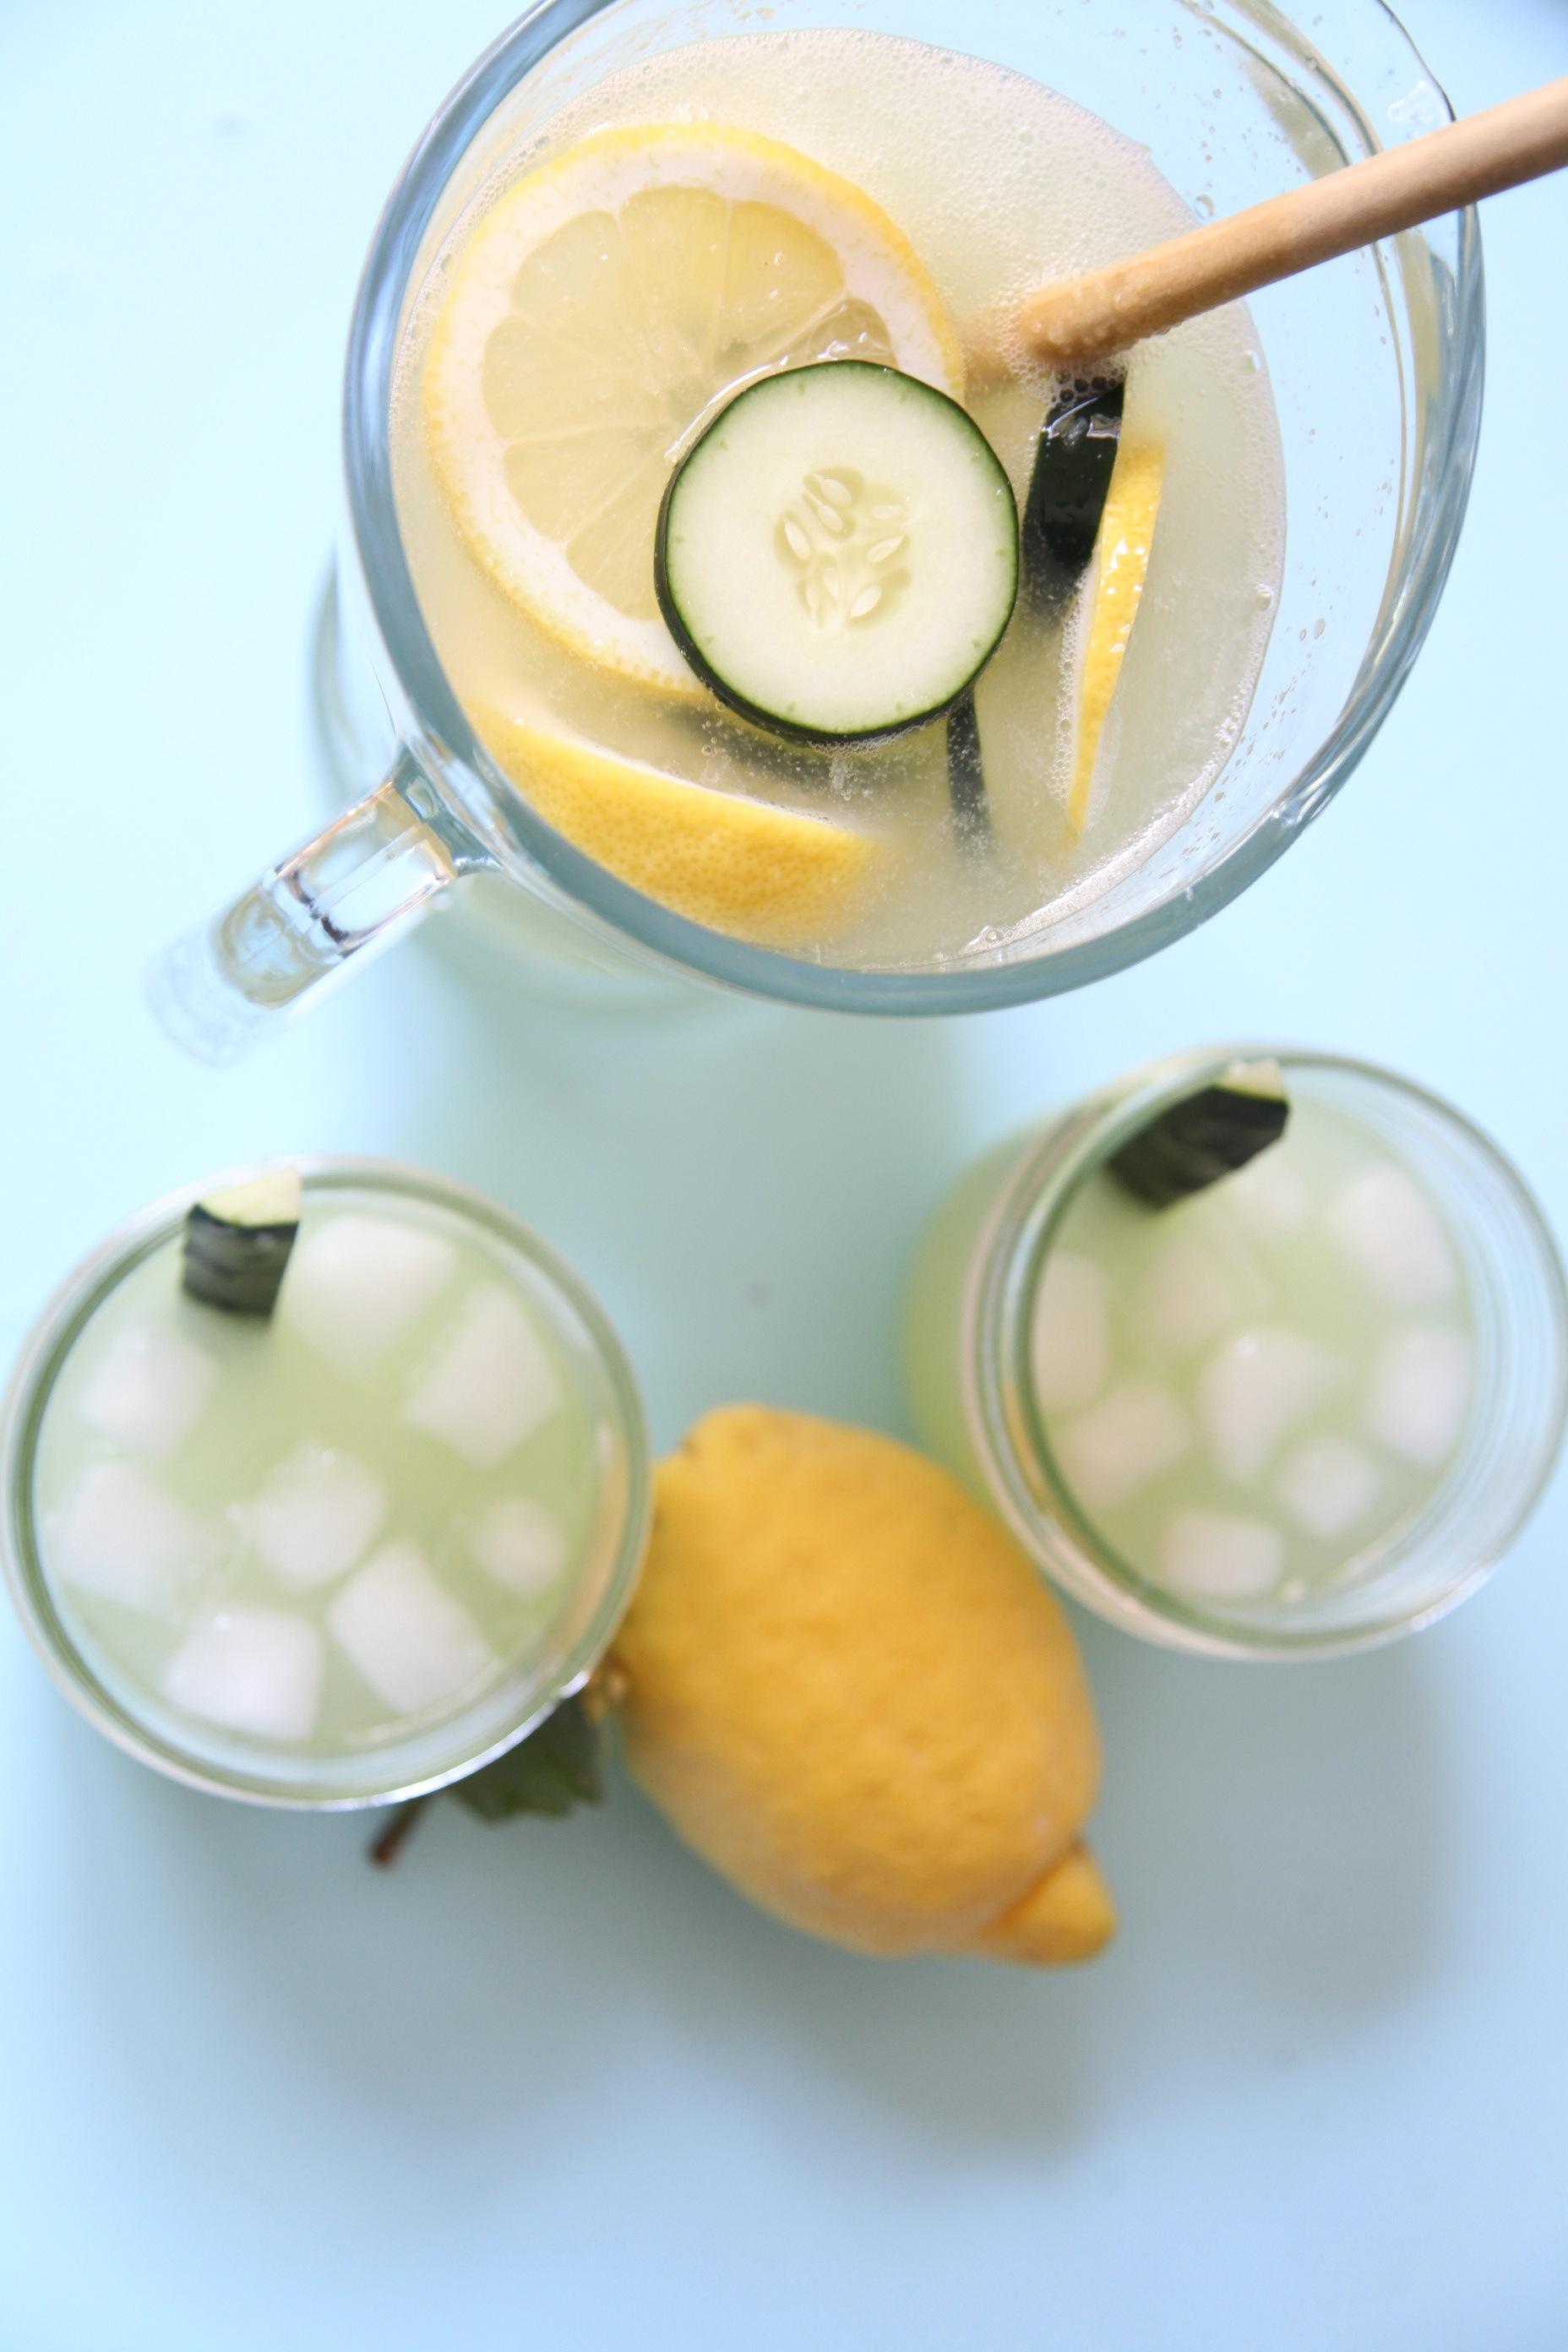 Cuke Lemon Fizz | Image by Lady Moon Farms